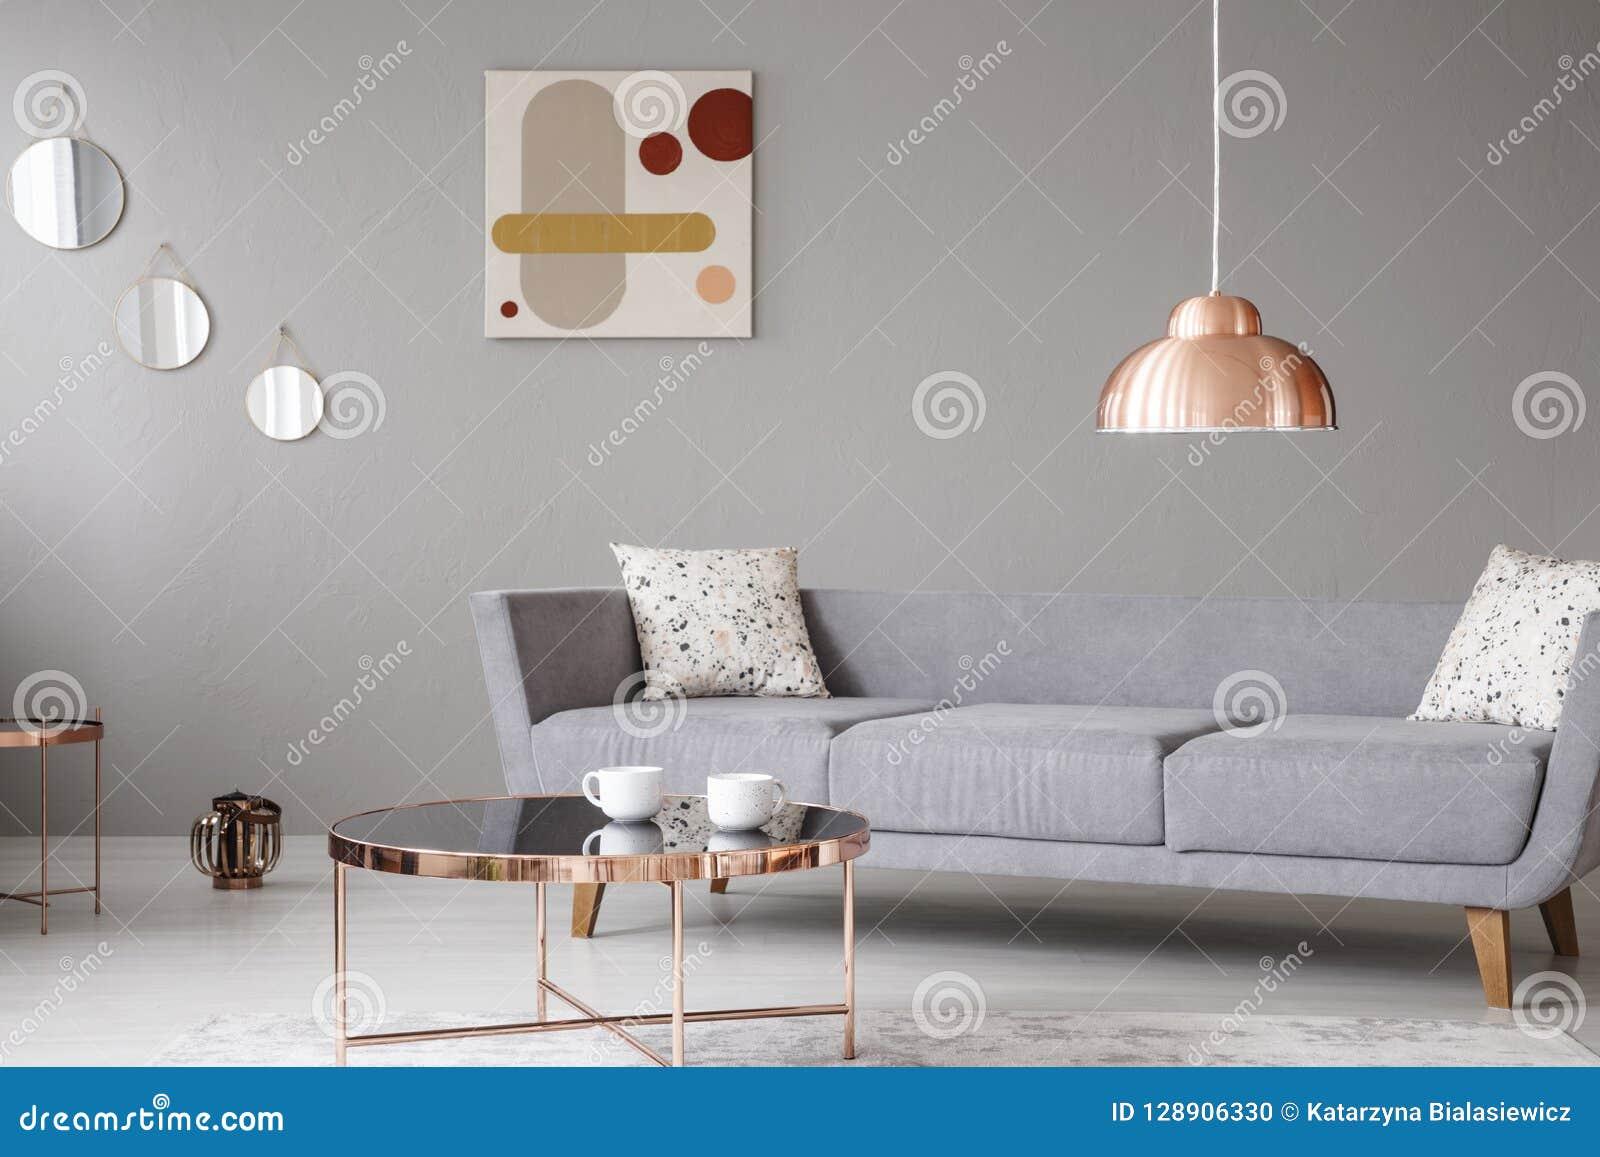 Kopparlamp- och kaffetabell framme av en modern soffa i en grå vardagsruminre